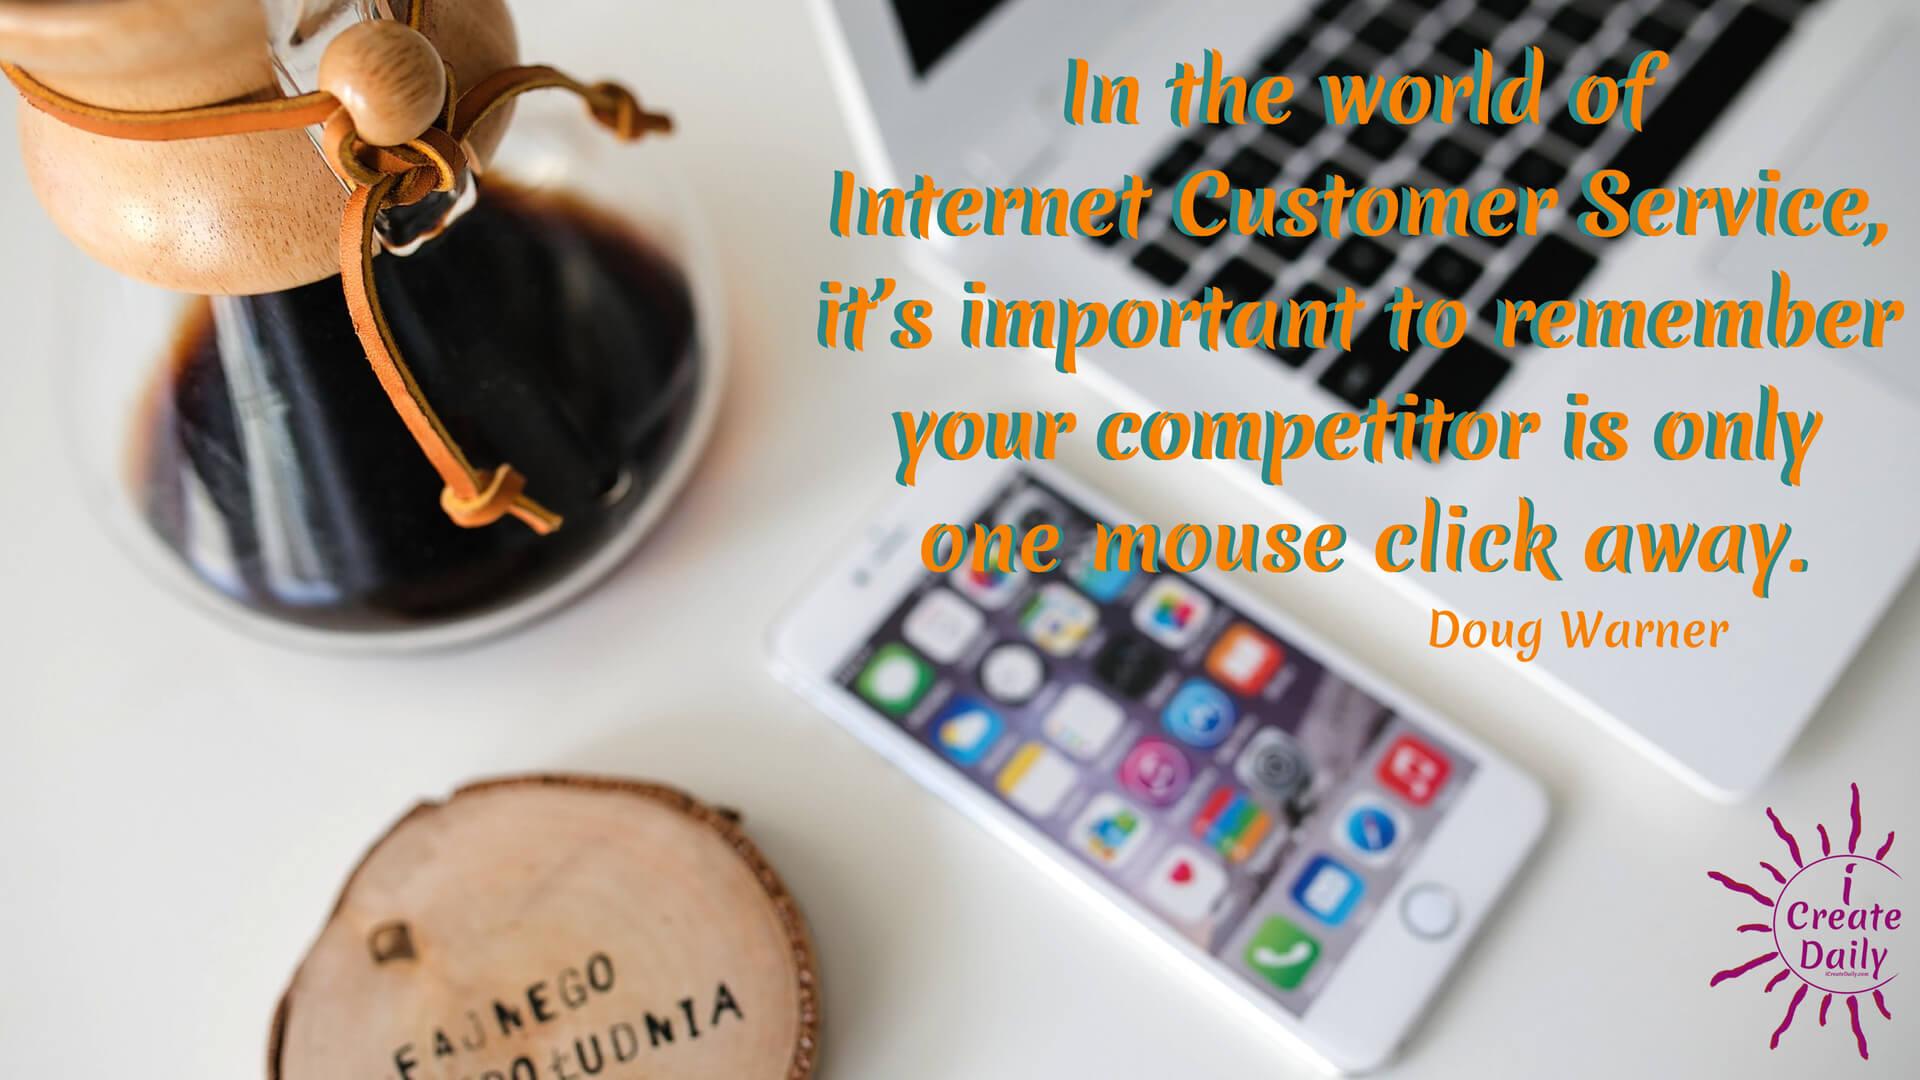 World of Internet Customer Service